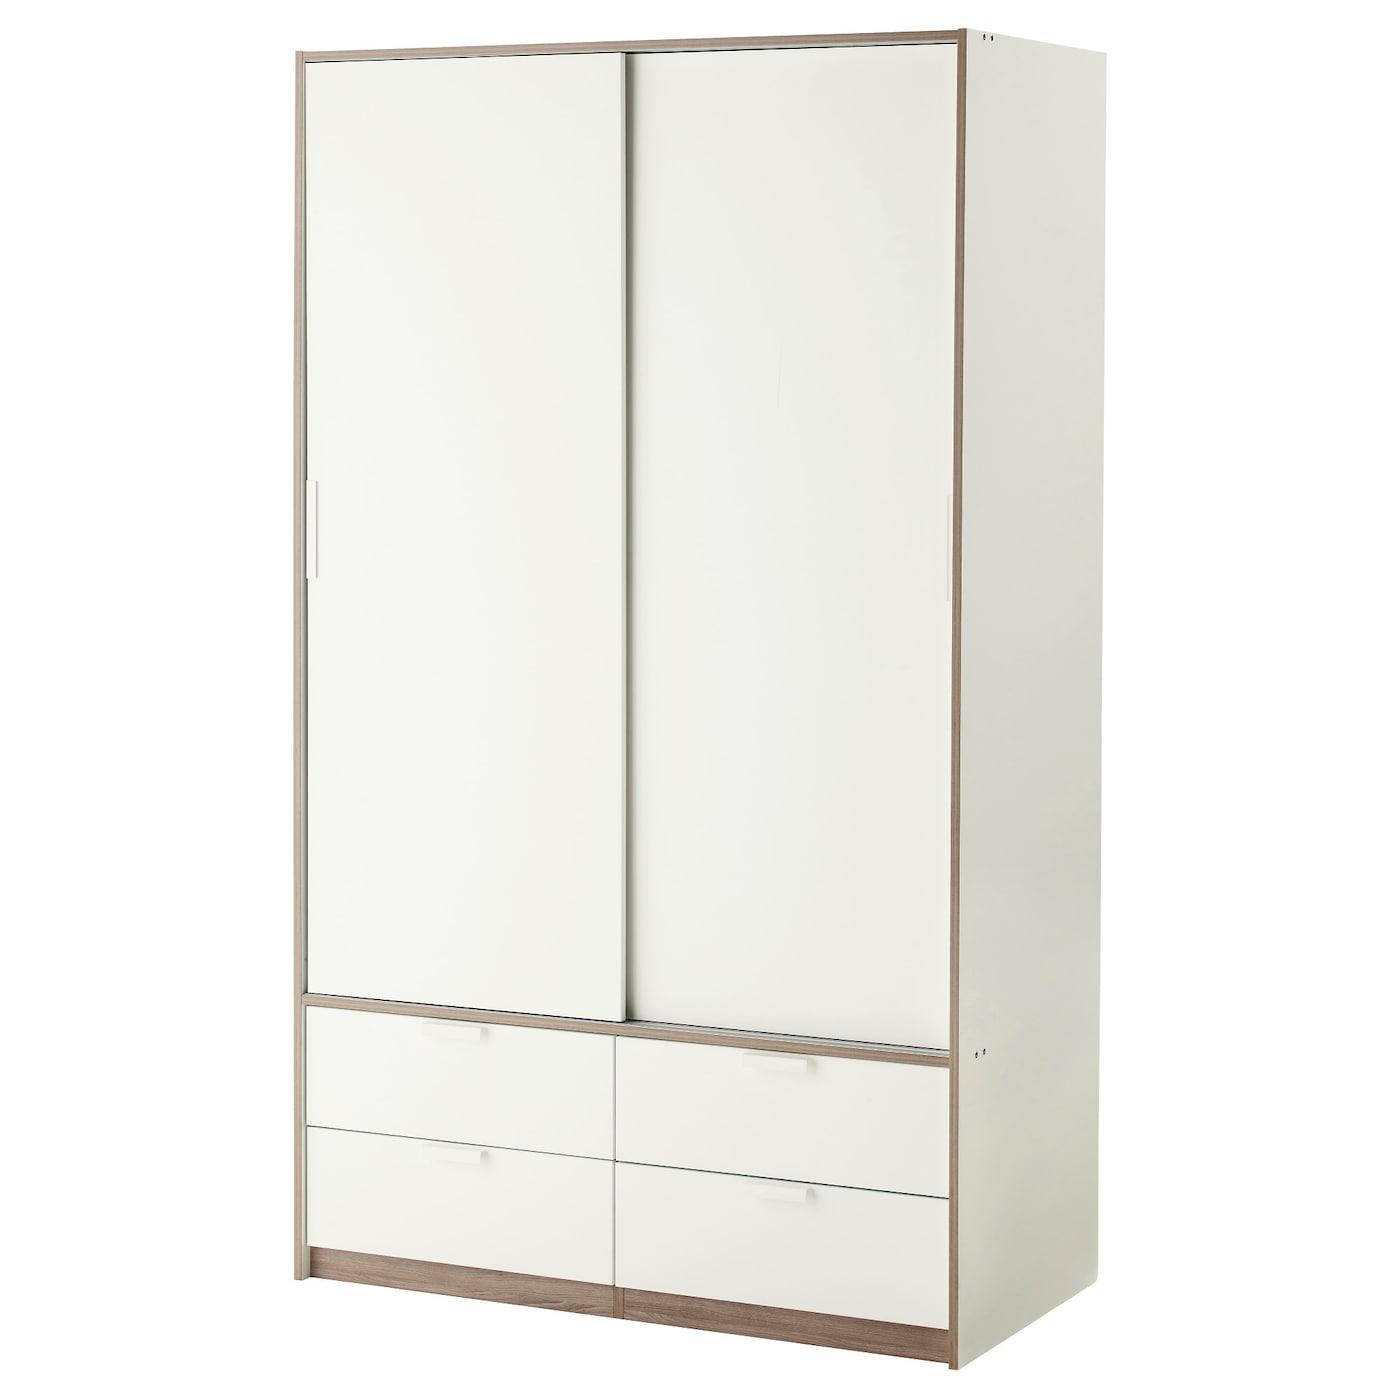 Kleerkasten - IKEA